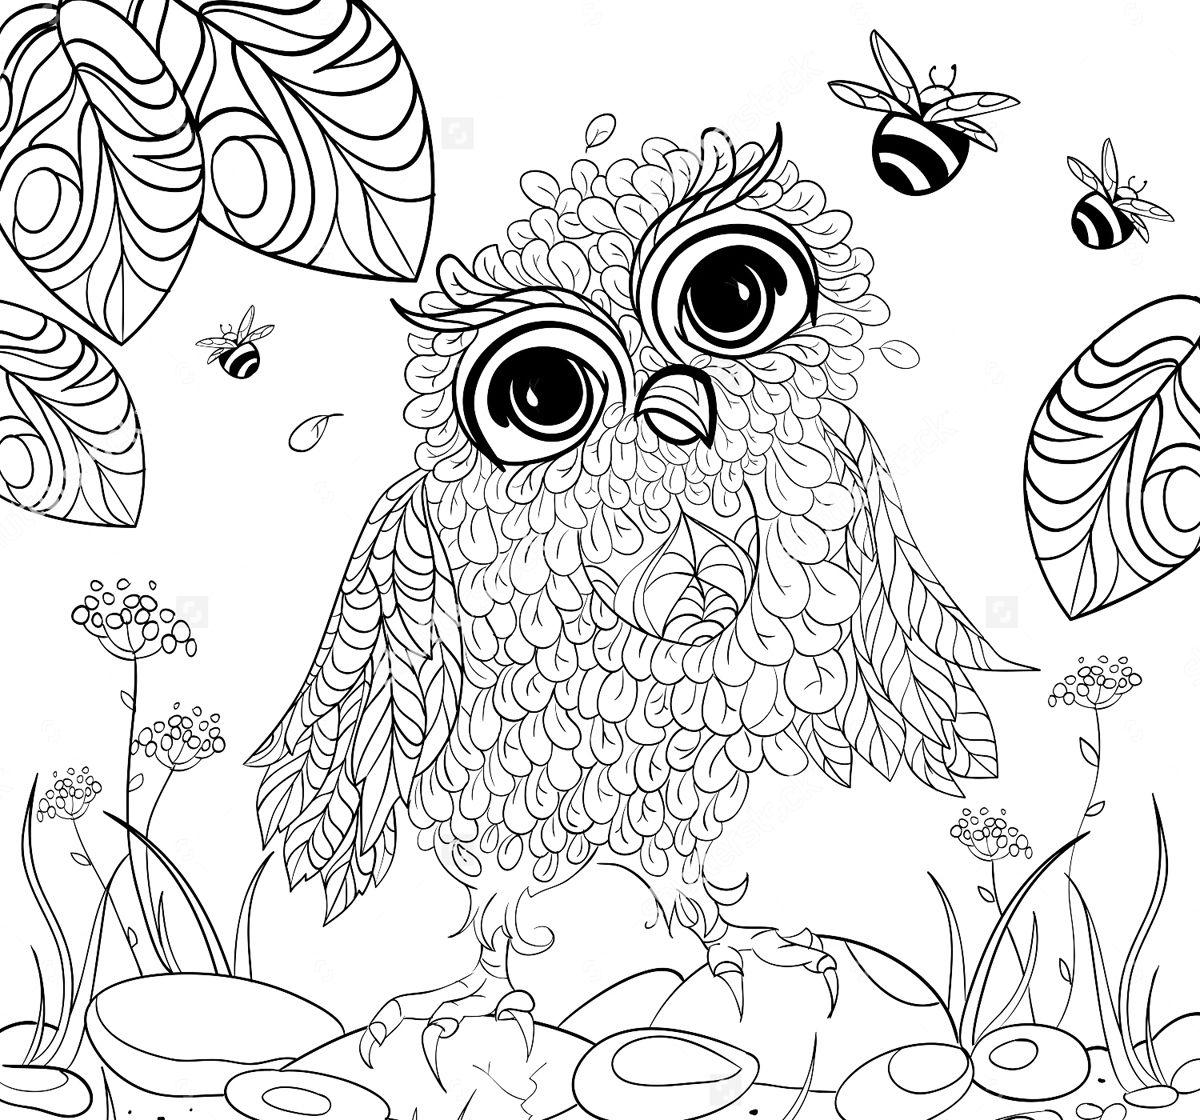 раскраска сова для снятия стресса | Книжка раскраска ...